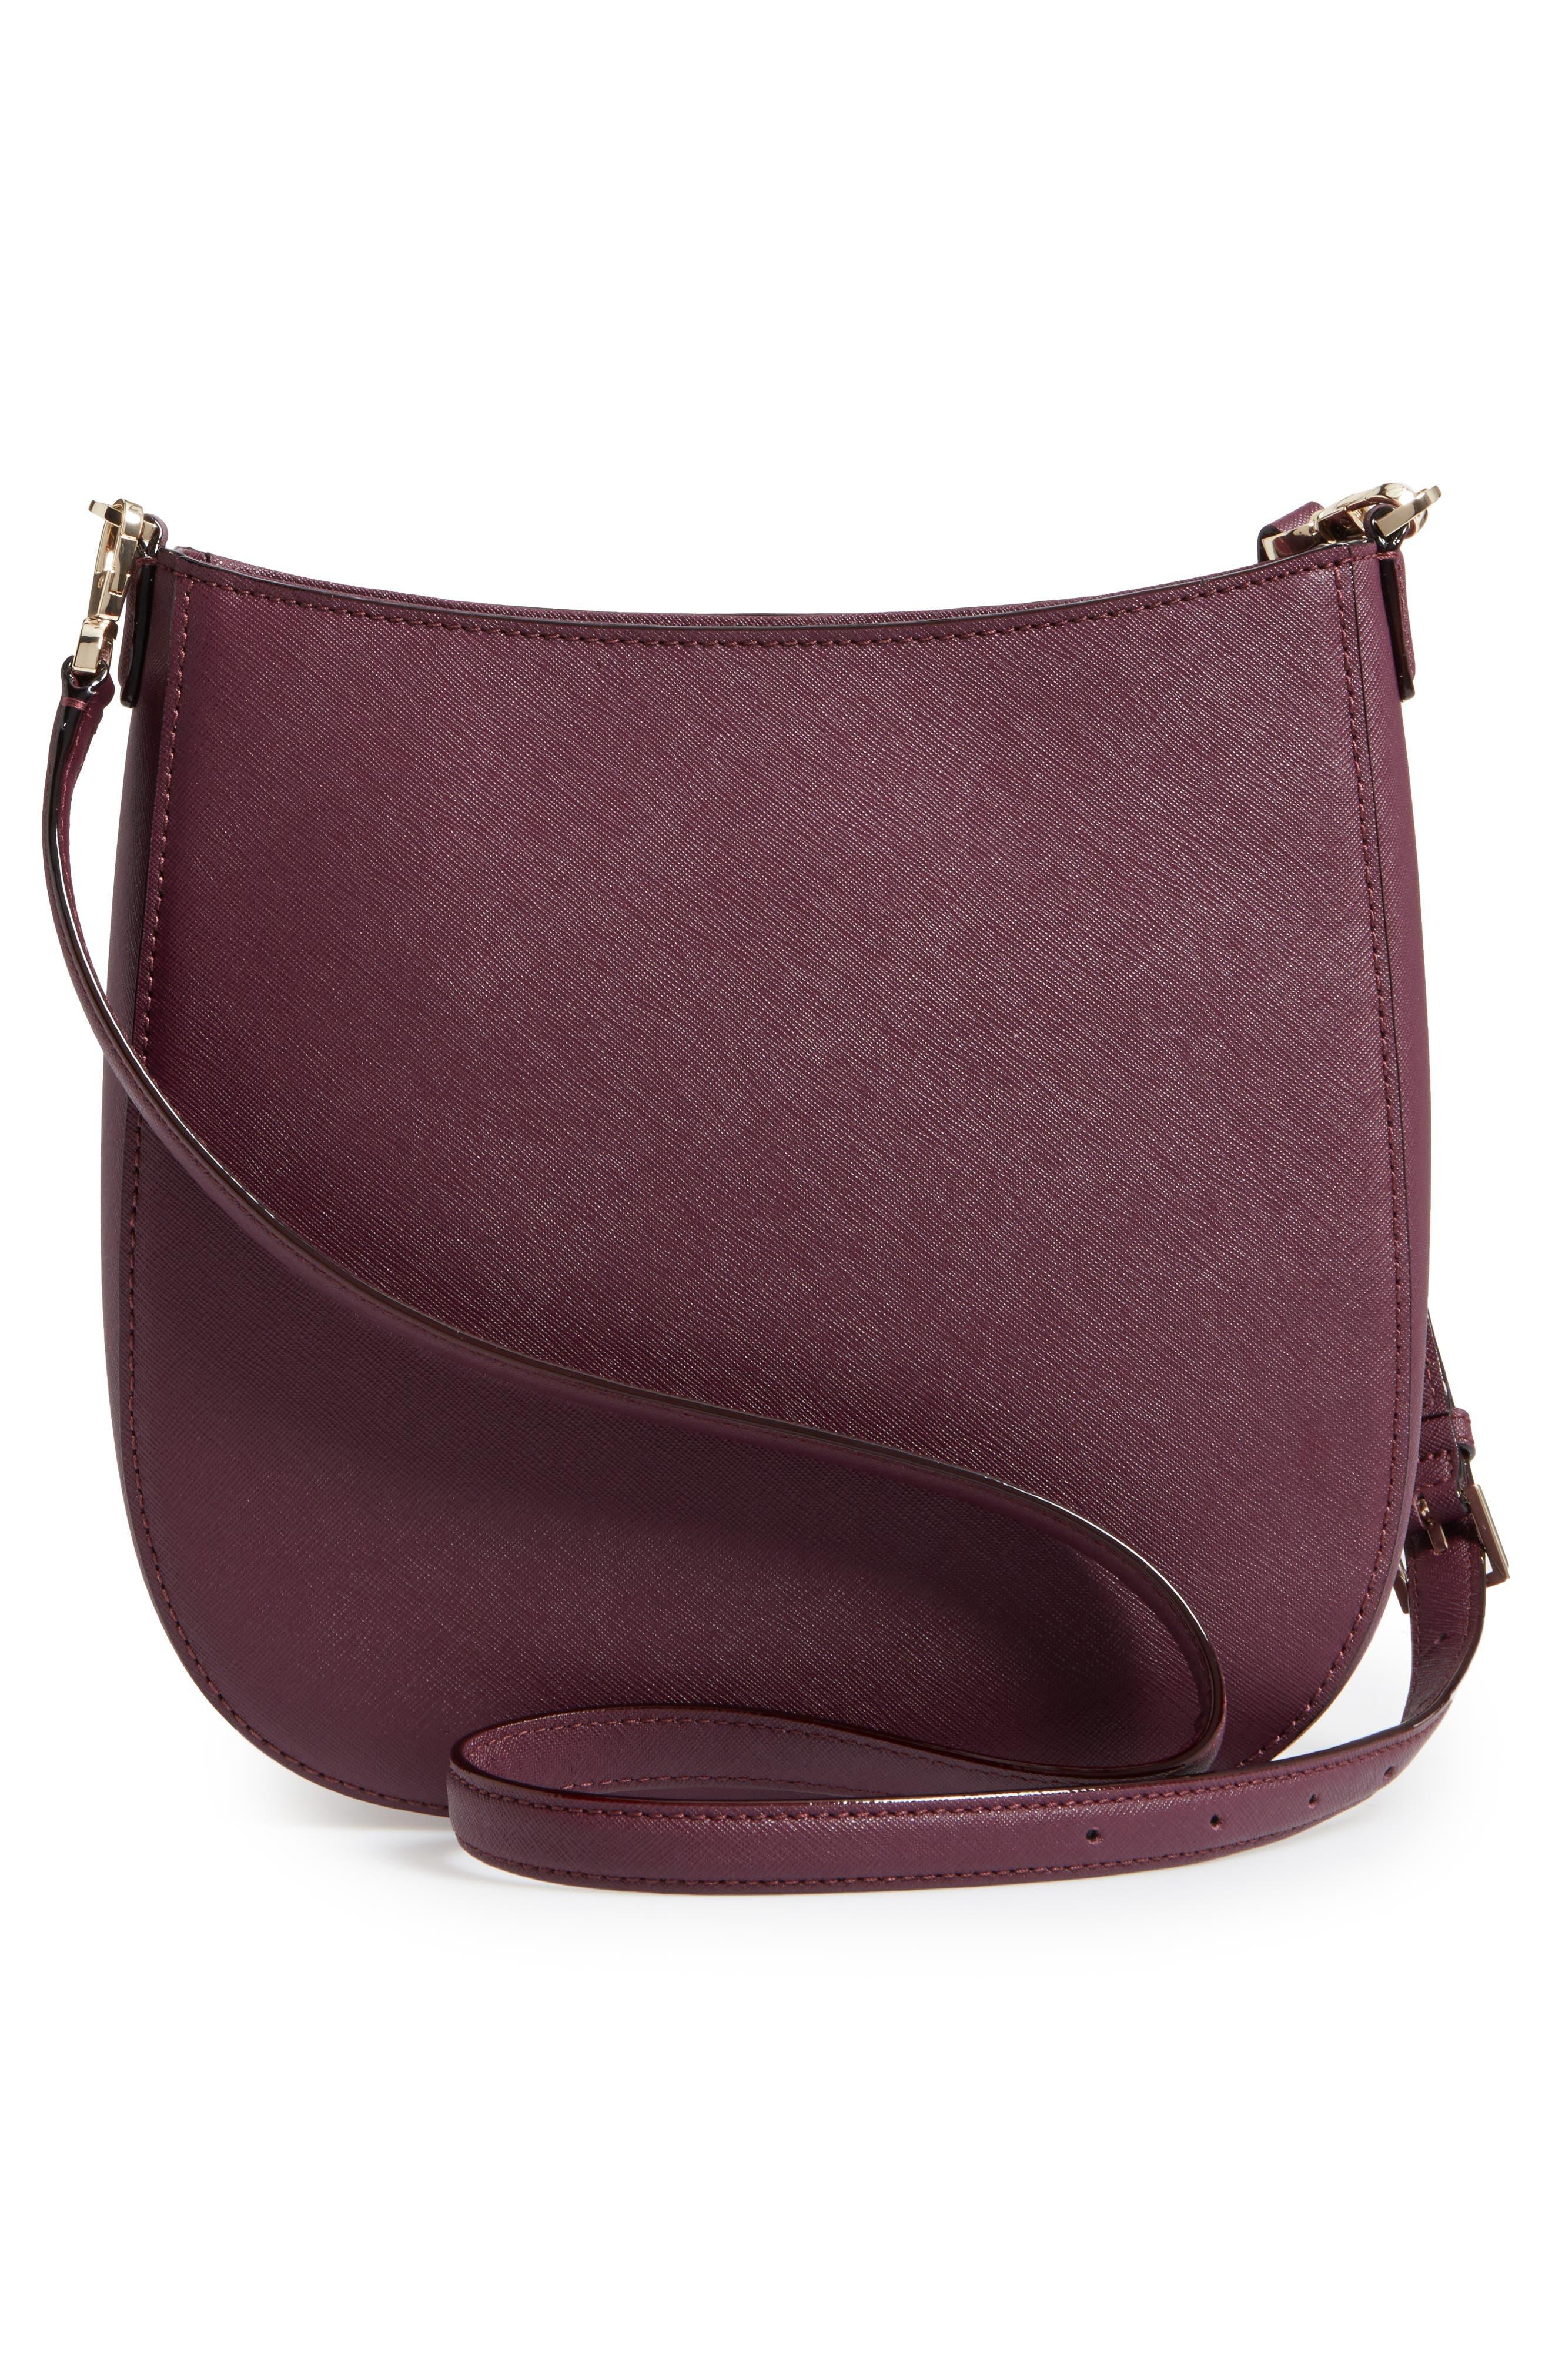 cameron street - robin leather crossbody bag,                             Alternate thumbnail 2, color,                             Deep Plum